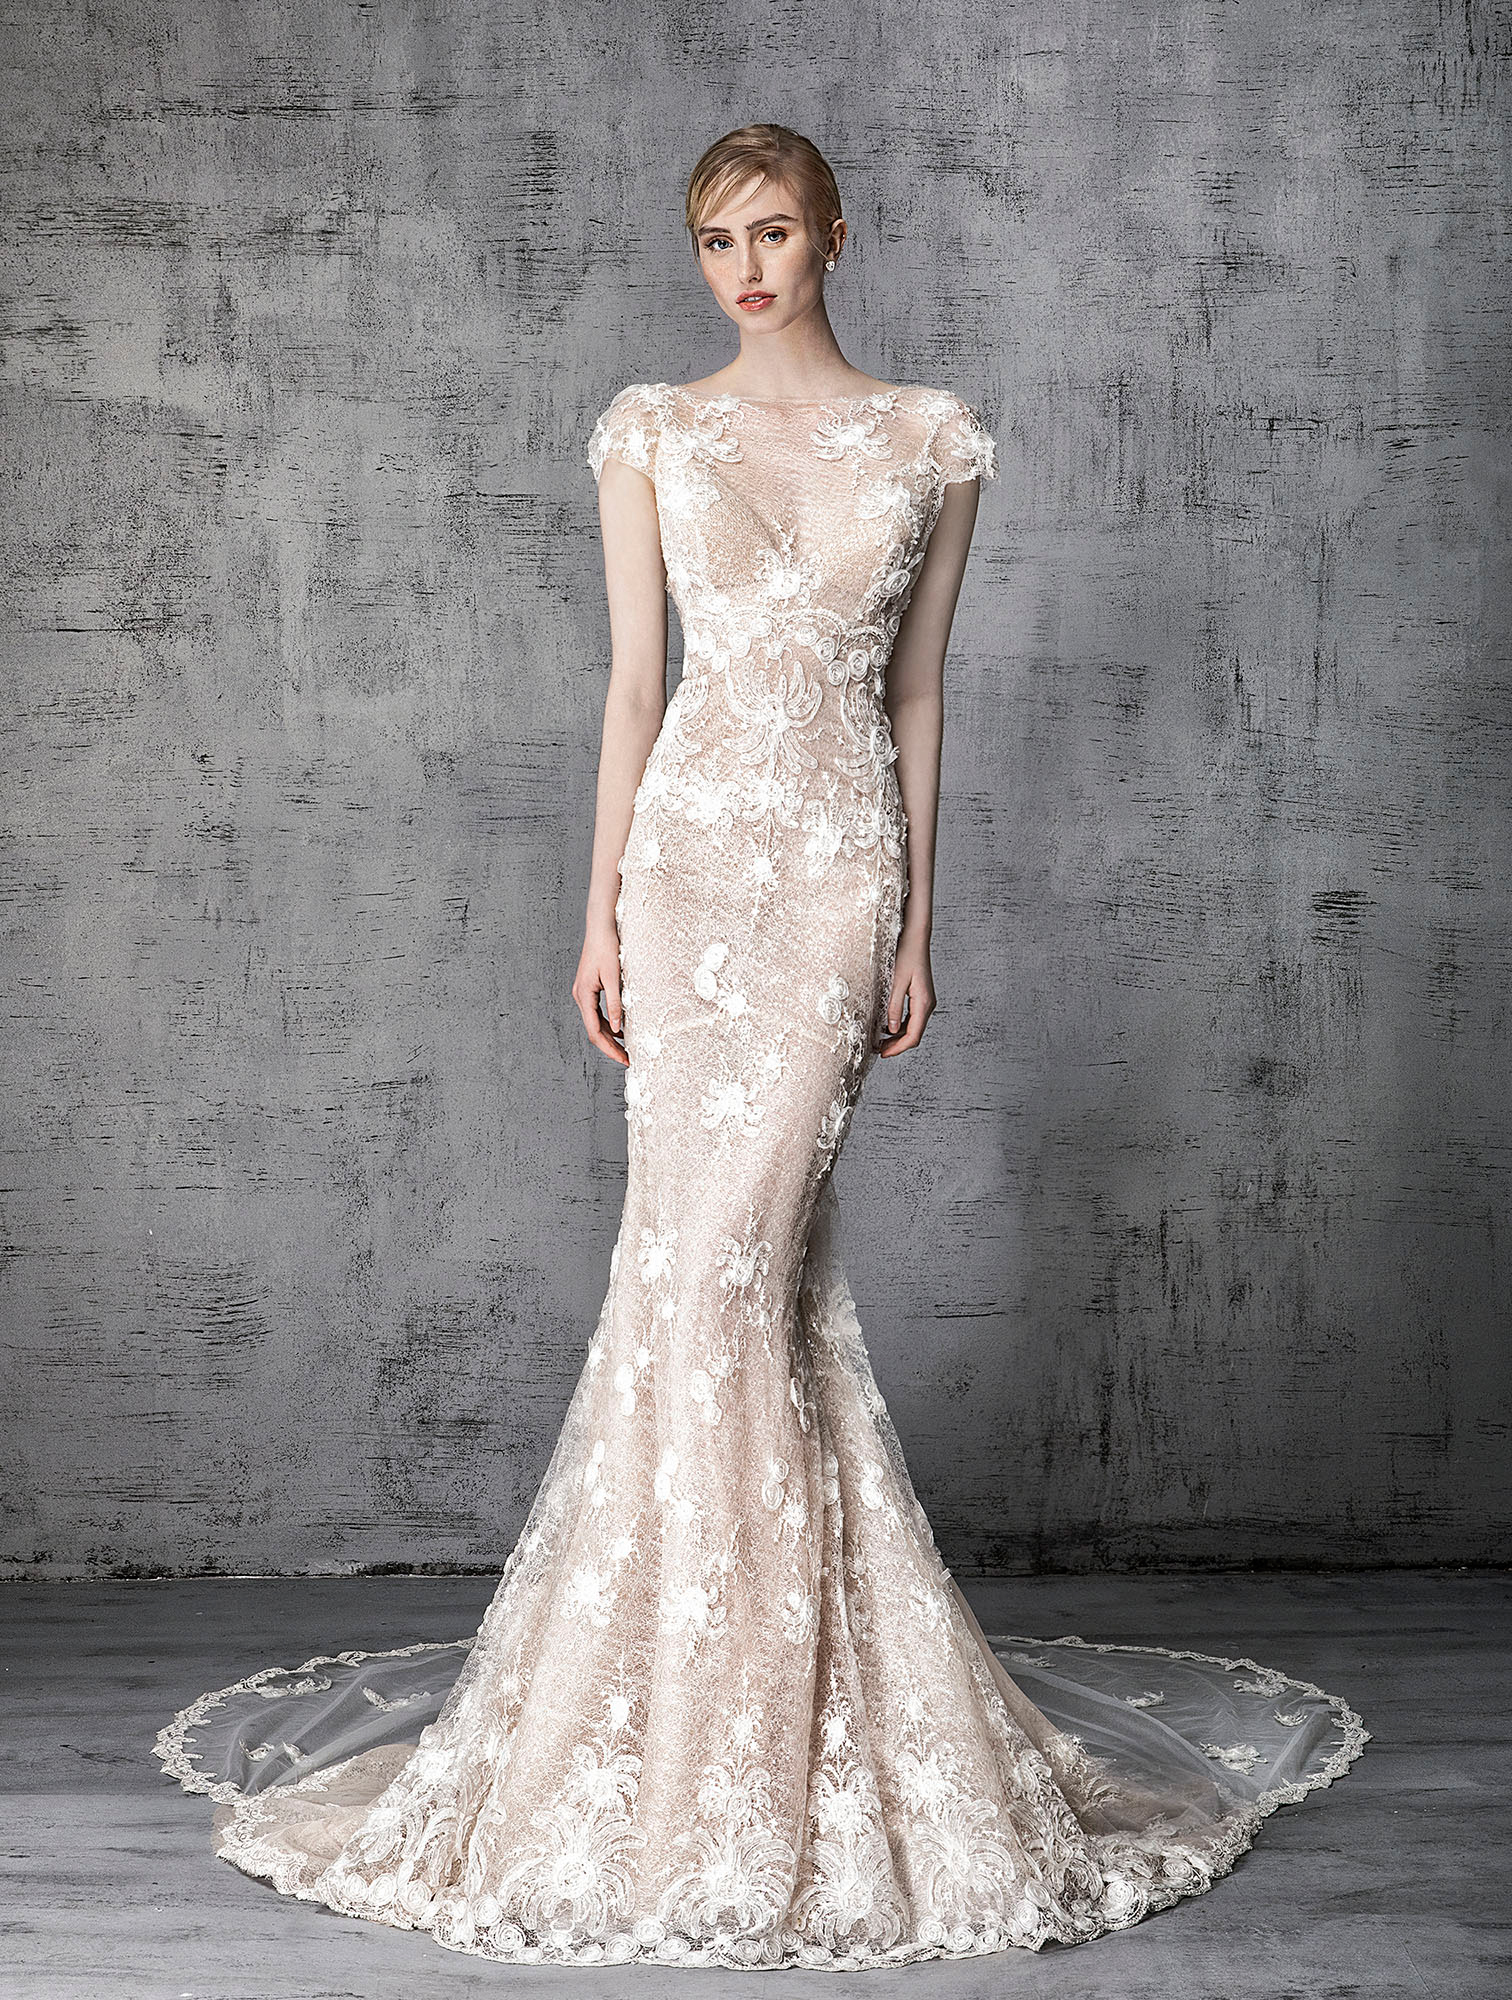 victoria kyriakides wedding dress spring 2019 cap-sleeve lace overlay